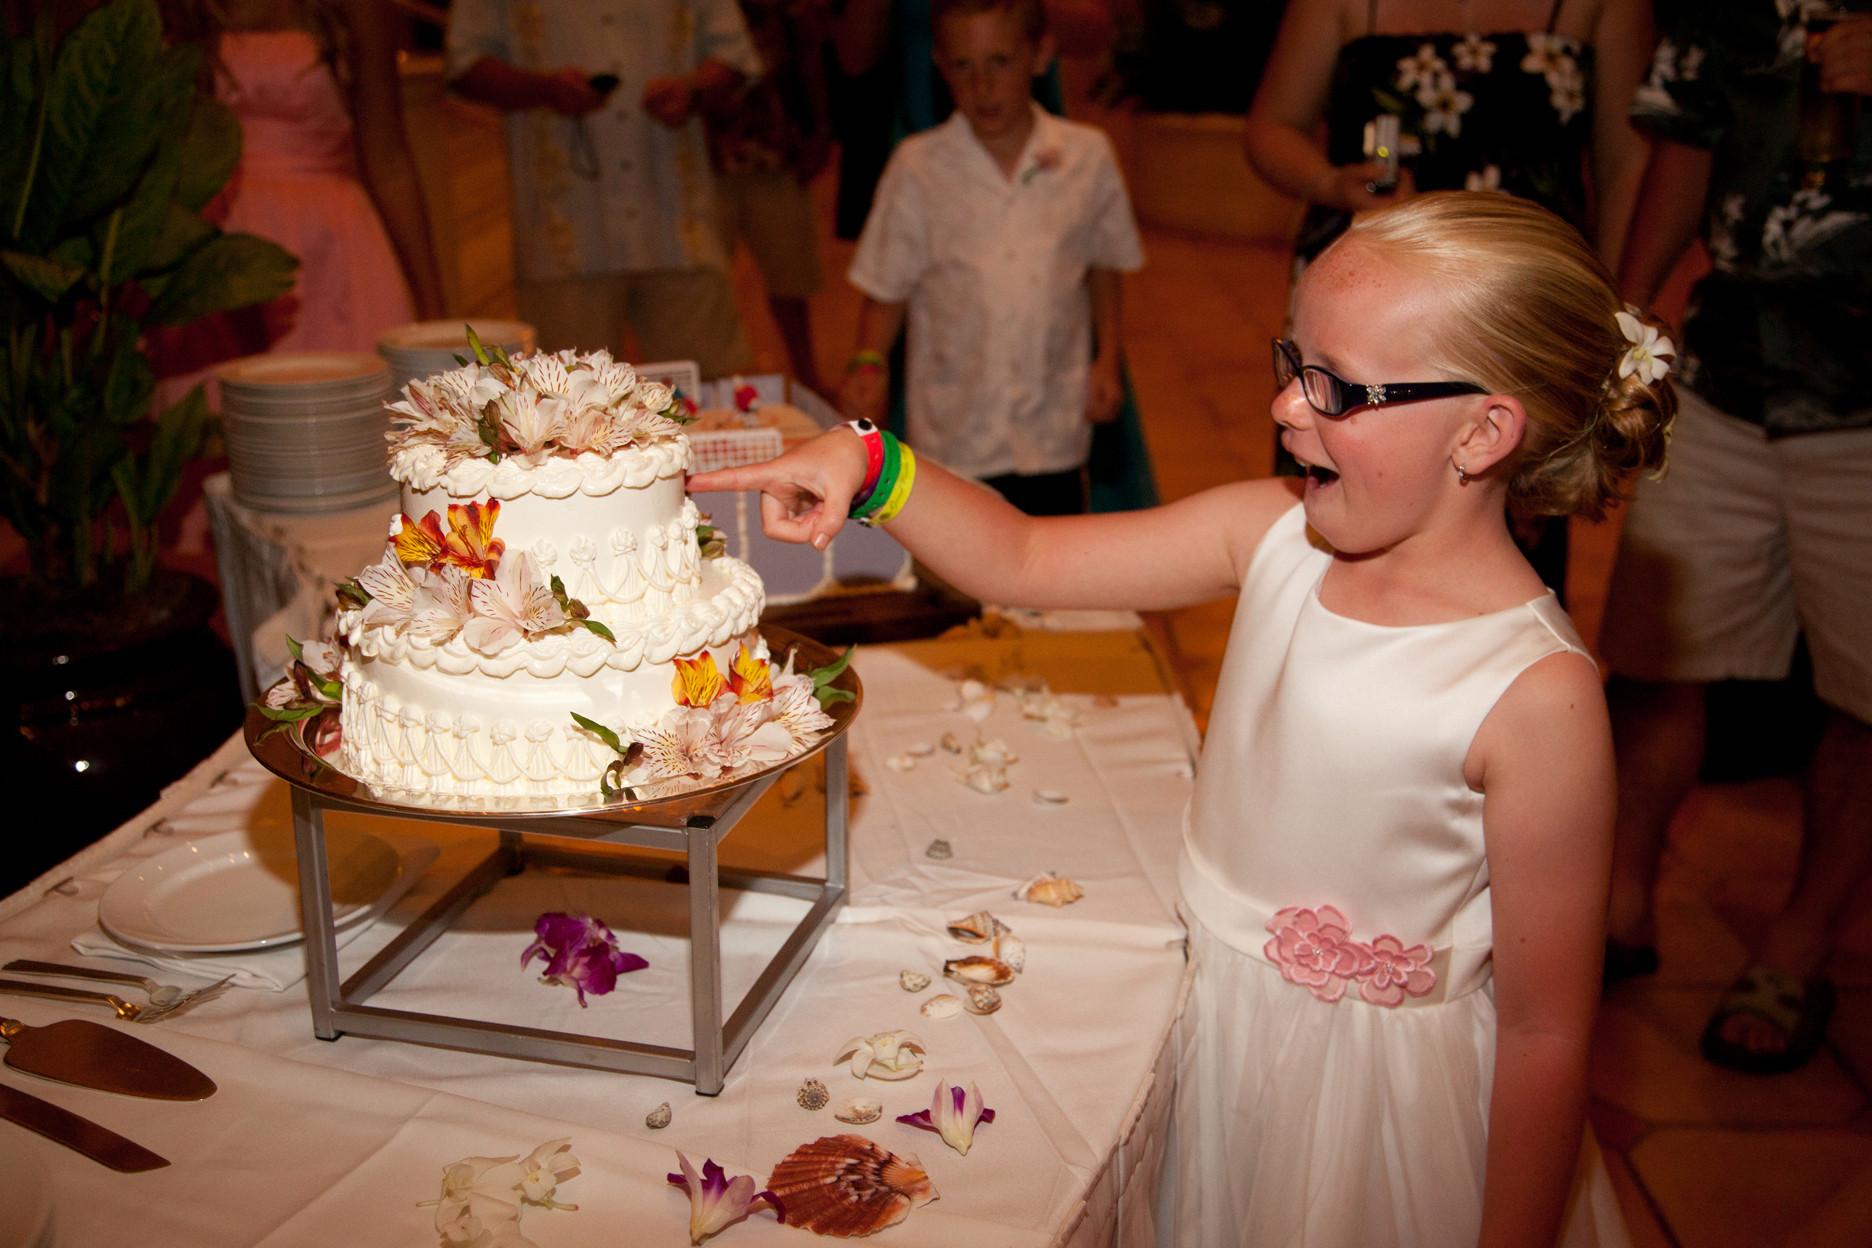 Wedding Cakes Upland Ca  Wedding Cakes Bakery tario Calif Bakery Chino